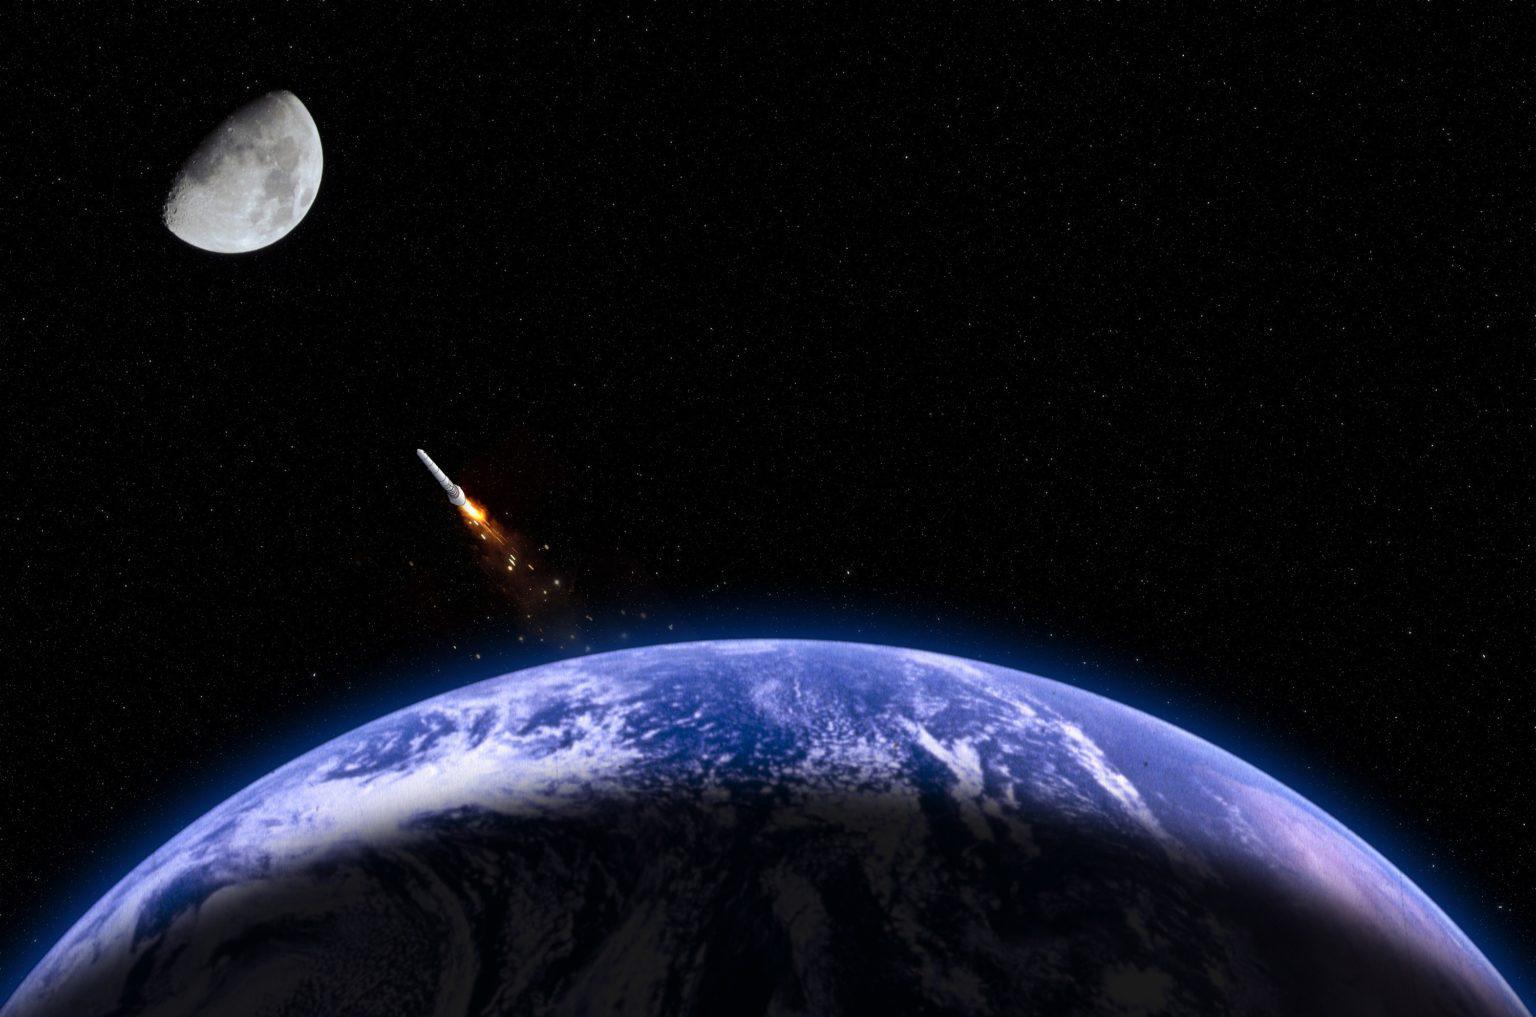 v10.1-rocket-to-moon2_139402367-2160-1536x1017.jpg